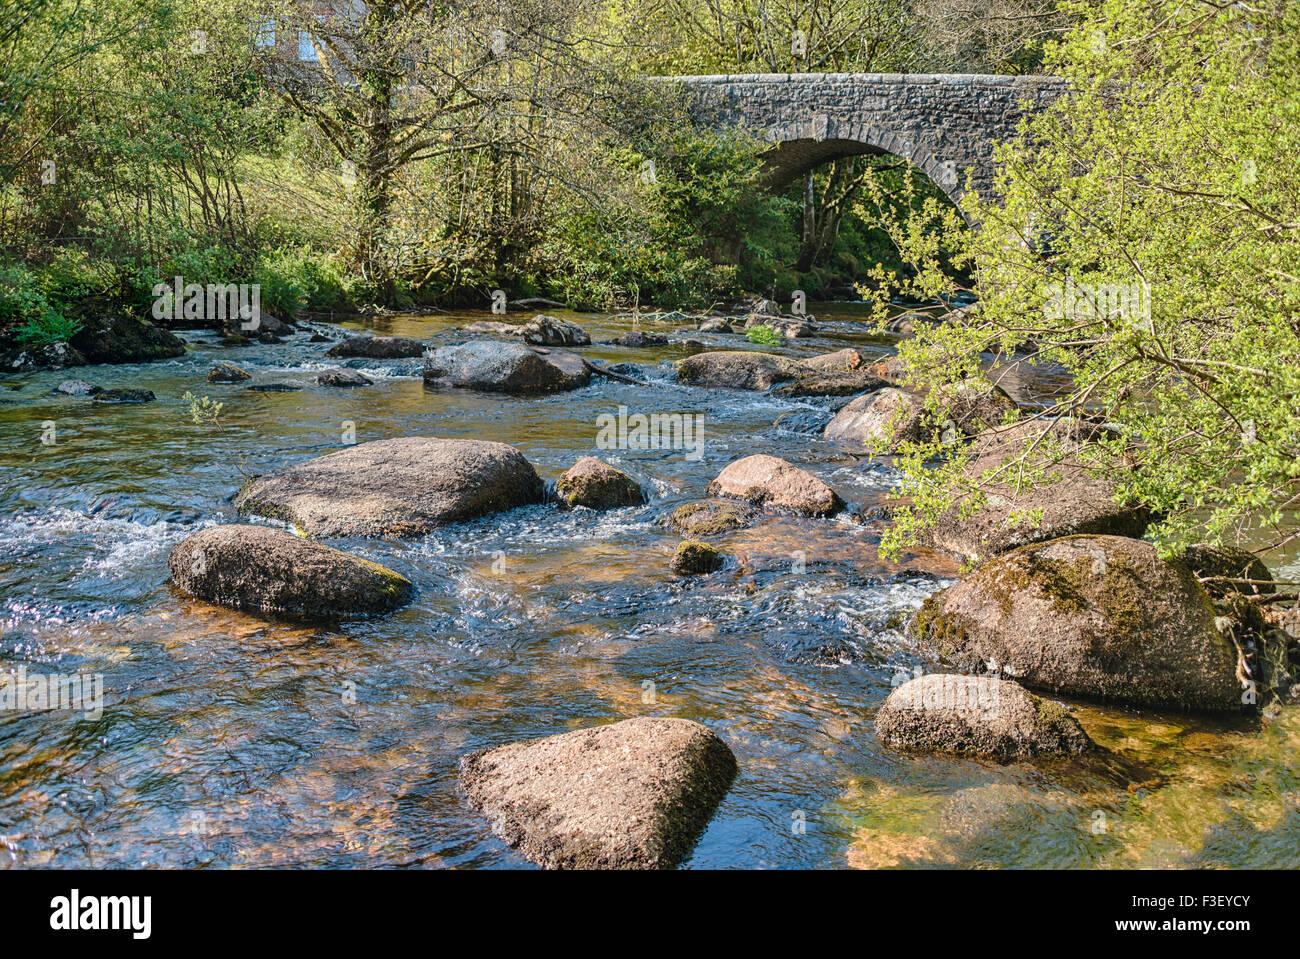 Cherry Brook River an der Dartmoor National Park, Devon, England, UK Stockbild